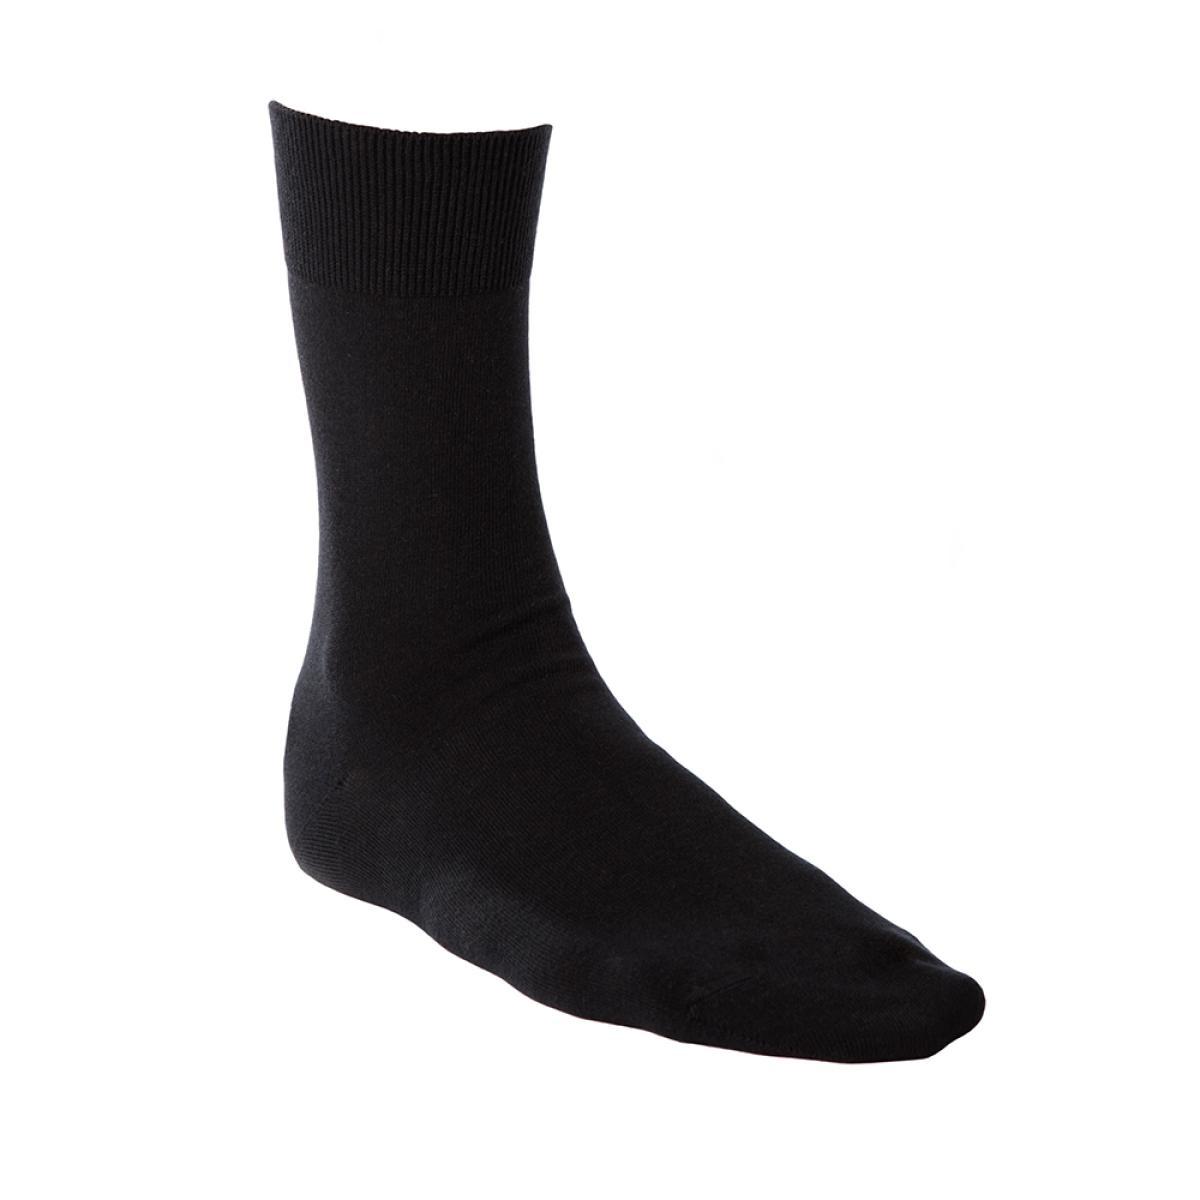 Living Crafts Damen/Herren Business-Socken 2er-Pack Bio-Baumwolle